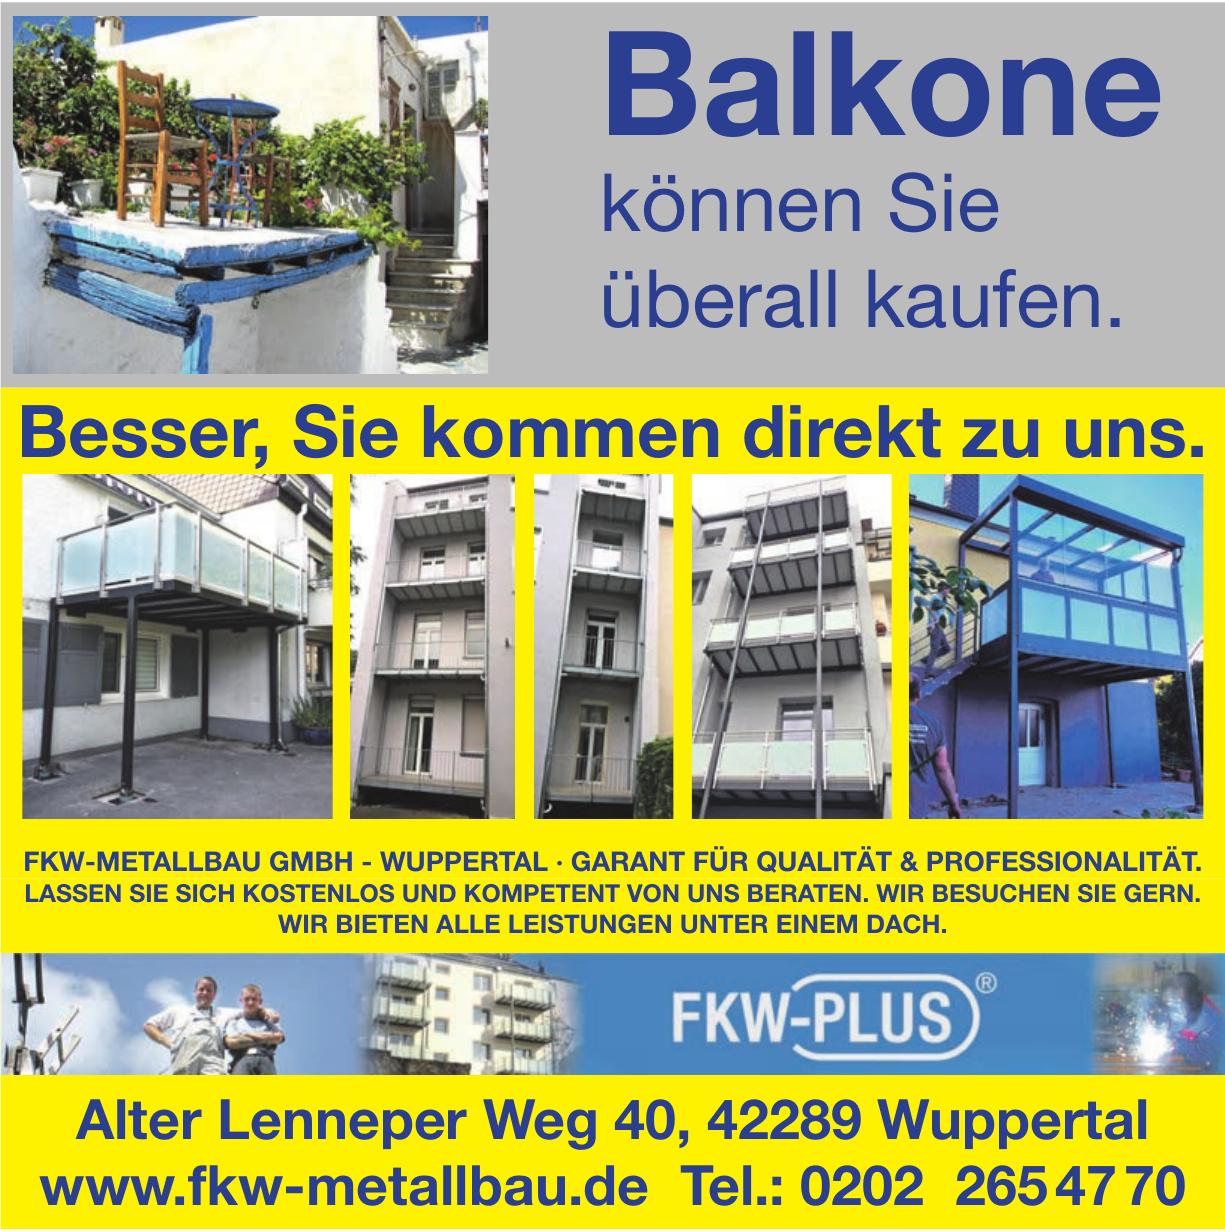 FKW-Metallbau GmbH